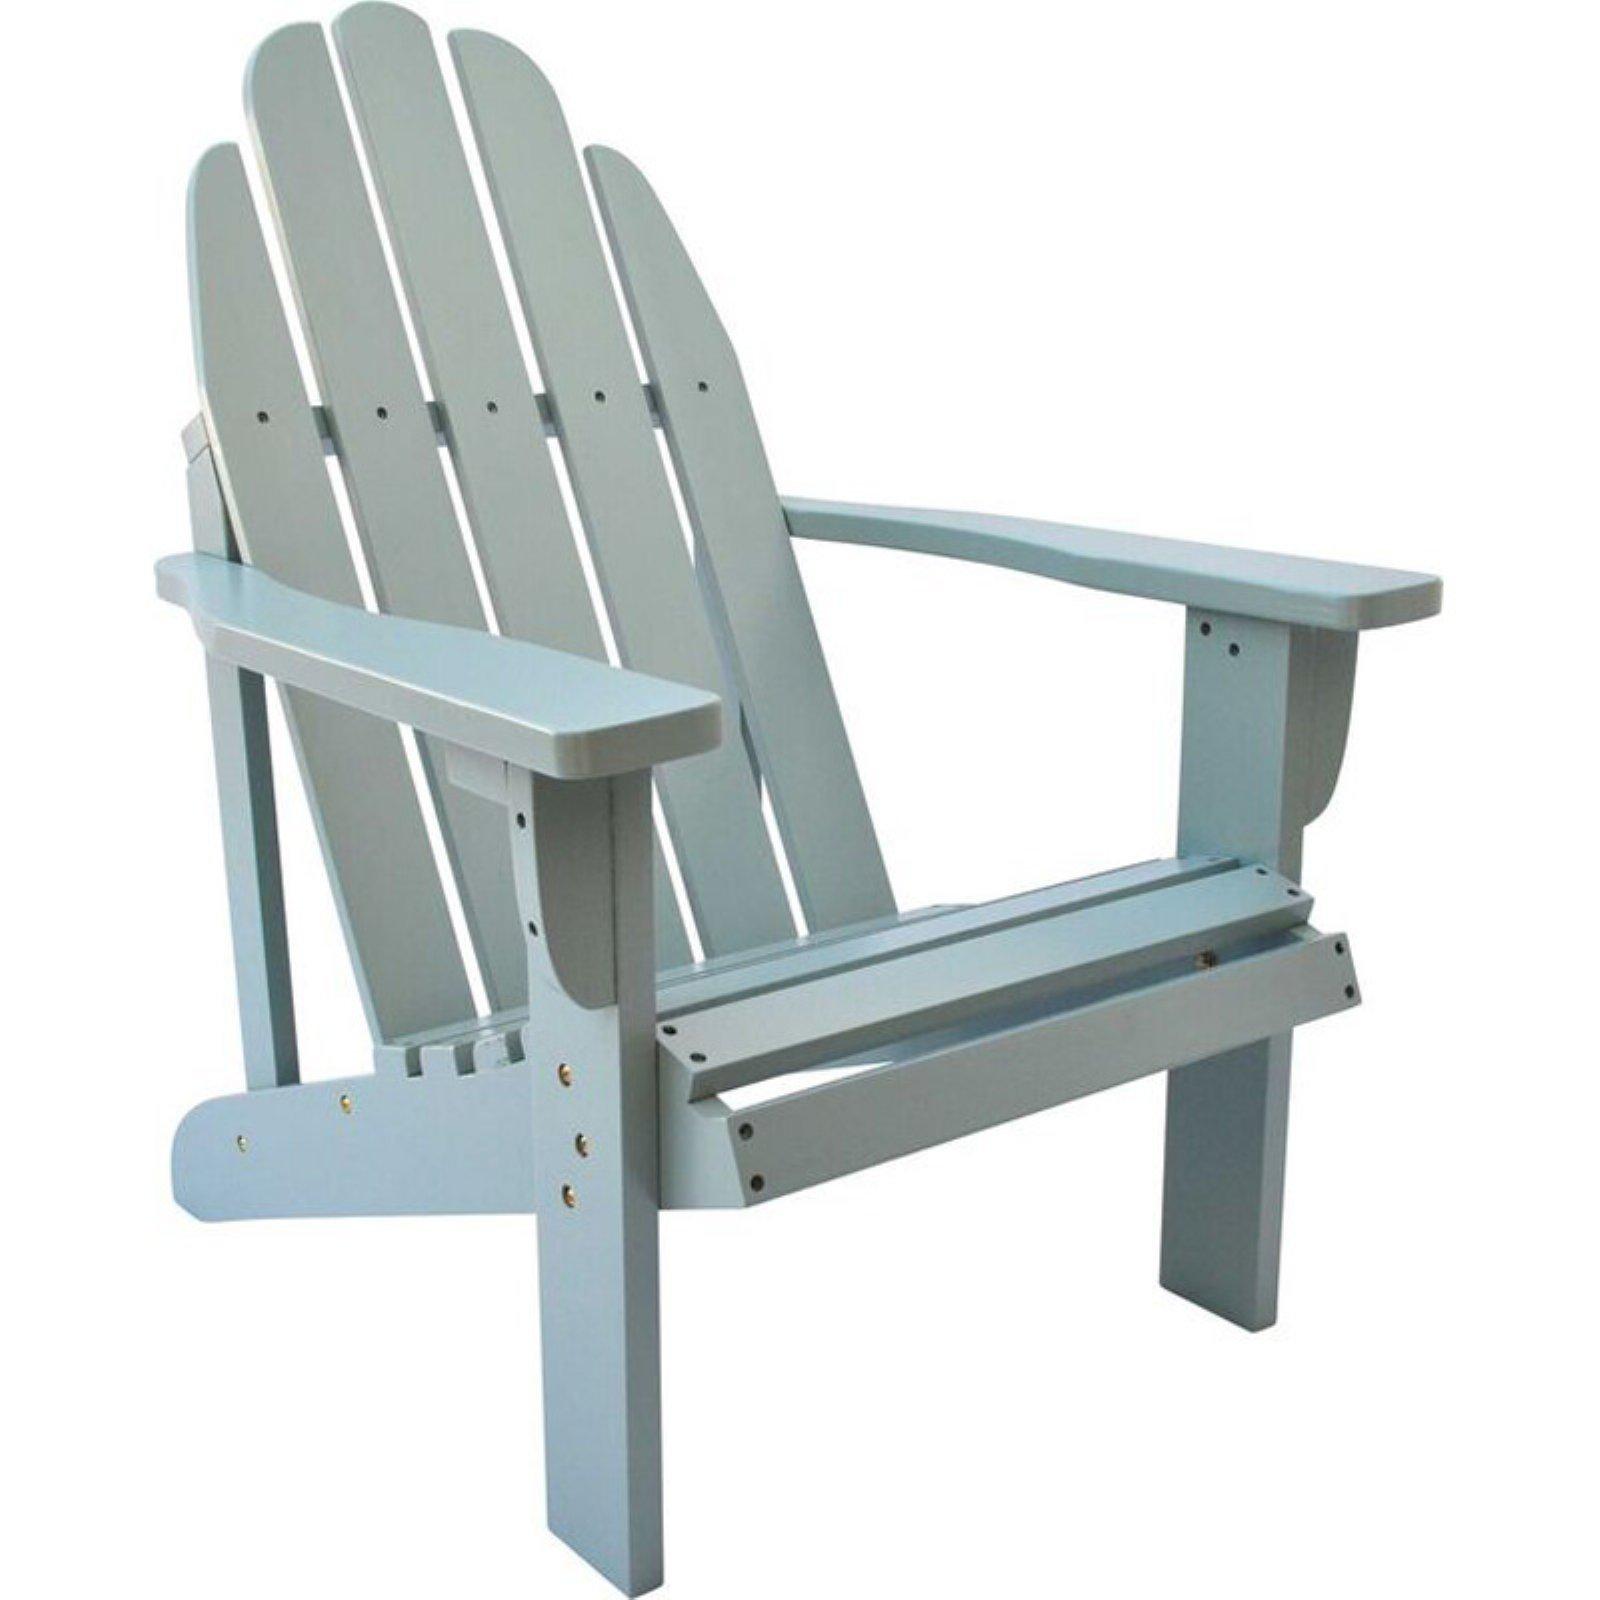 Shine Company Catalina Adirondack Chair - Dutch Blue